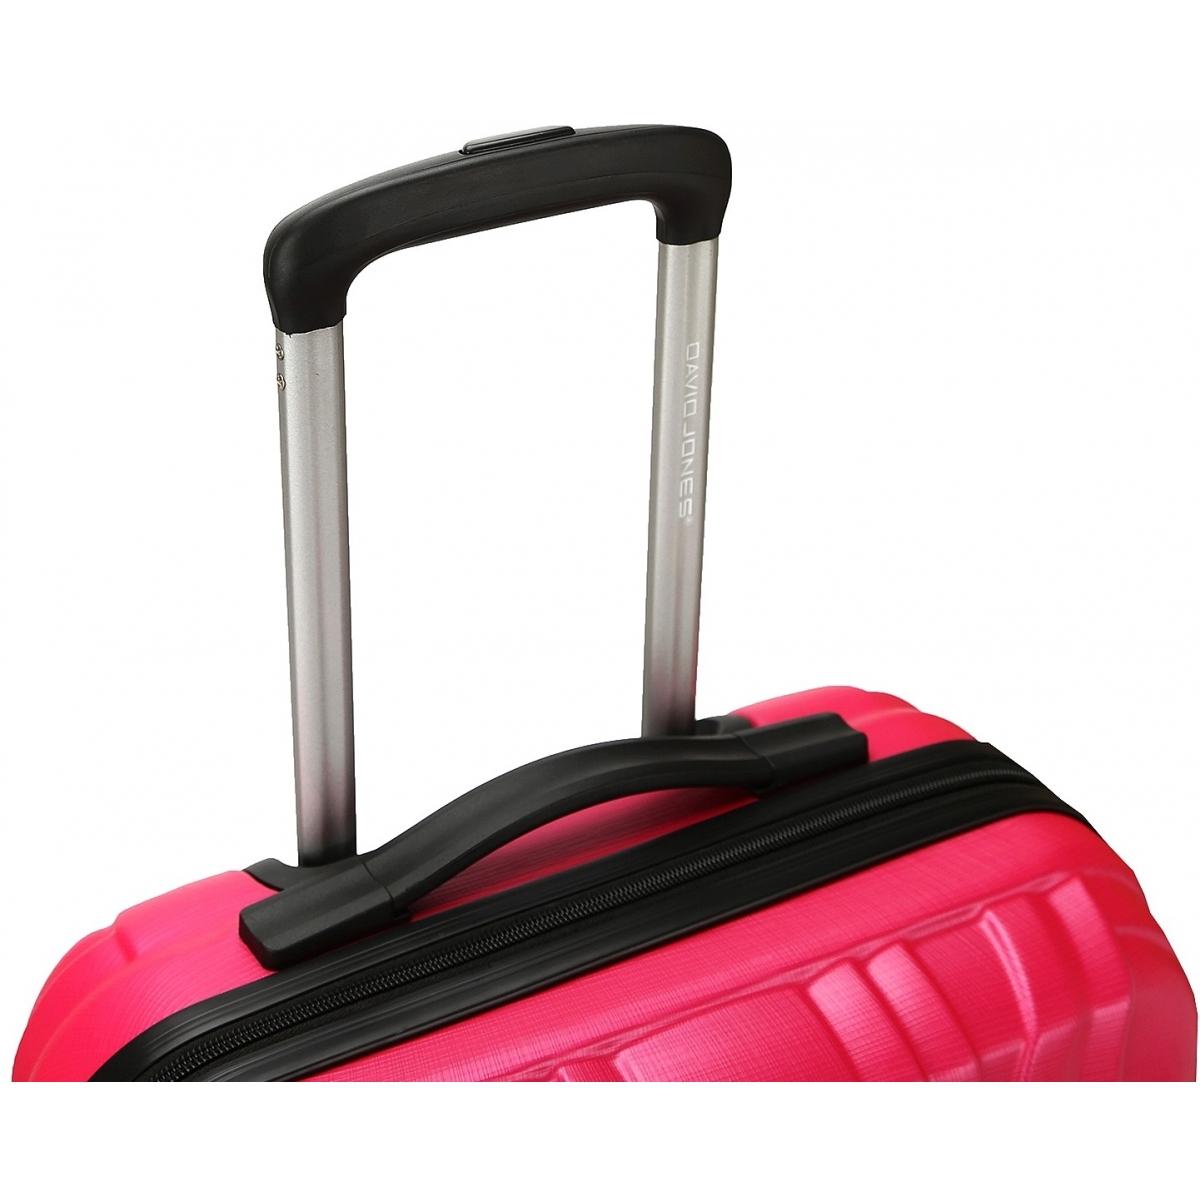 valise rigide david jones taille g 76cm ba10171g couleur principale fushia promotion. Black Bedroom Furniture Sets. Home Design Ideas